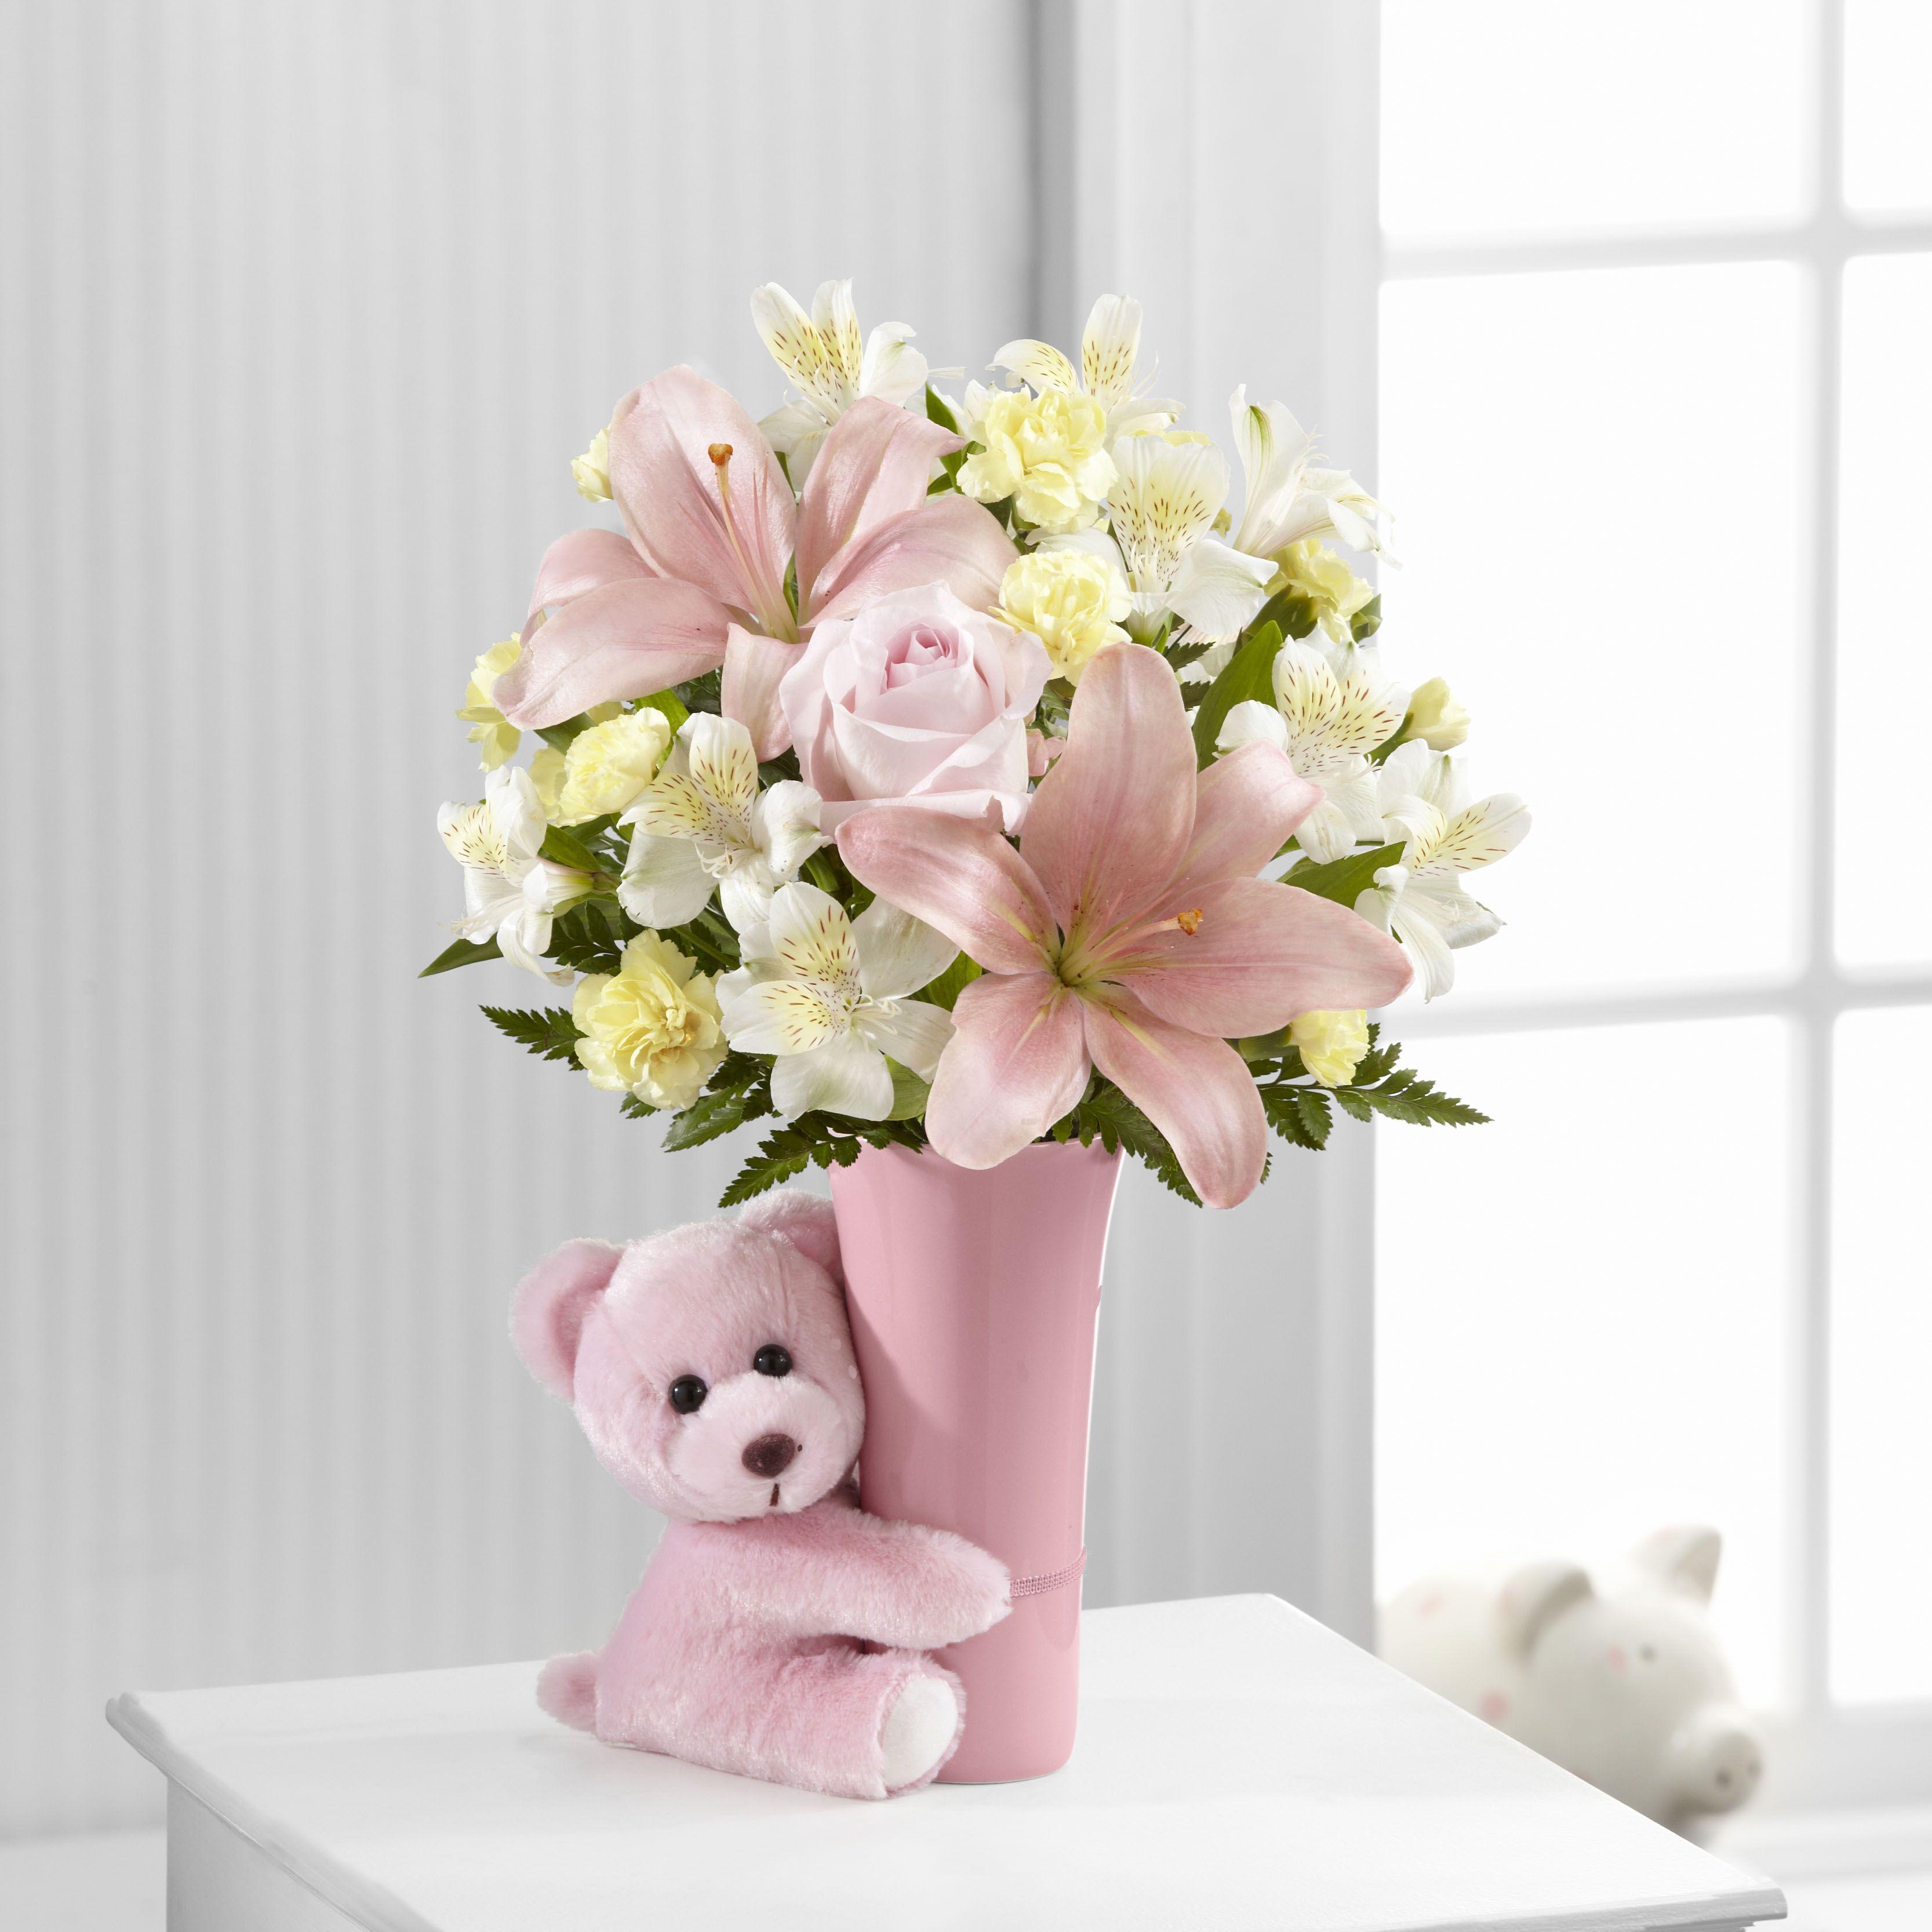 Crevasses Florist Part - 17: www.jardincaribe.com New Baby Flowers, Order Flowers, Flowers Online, Send